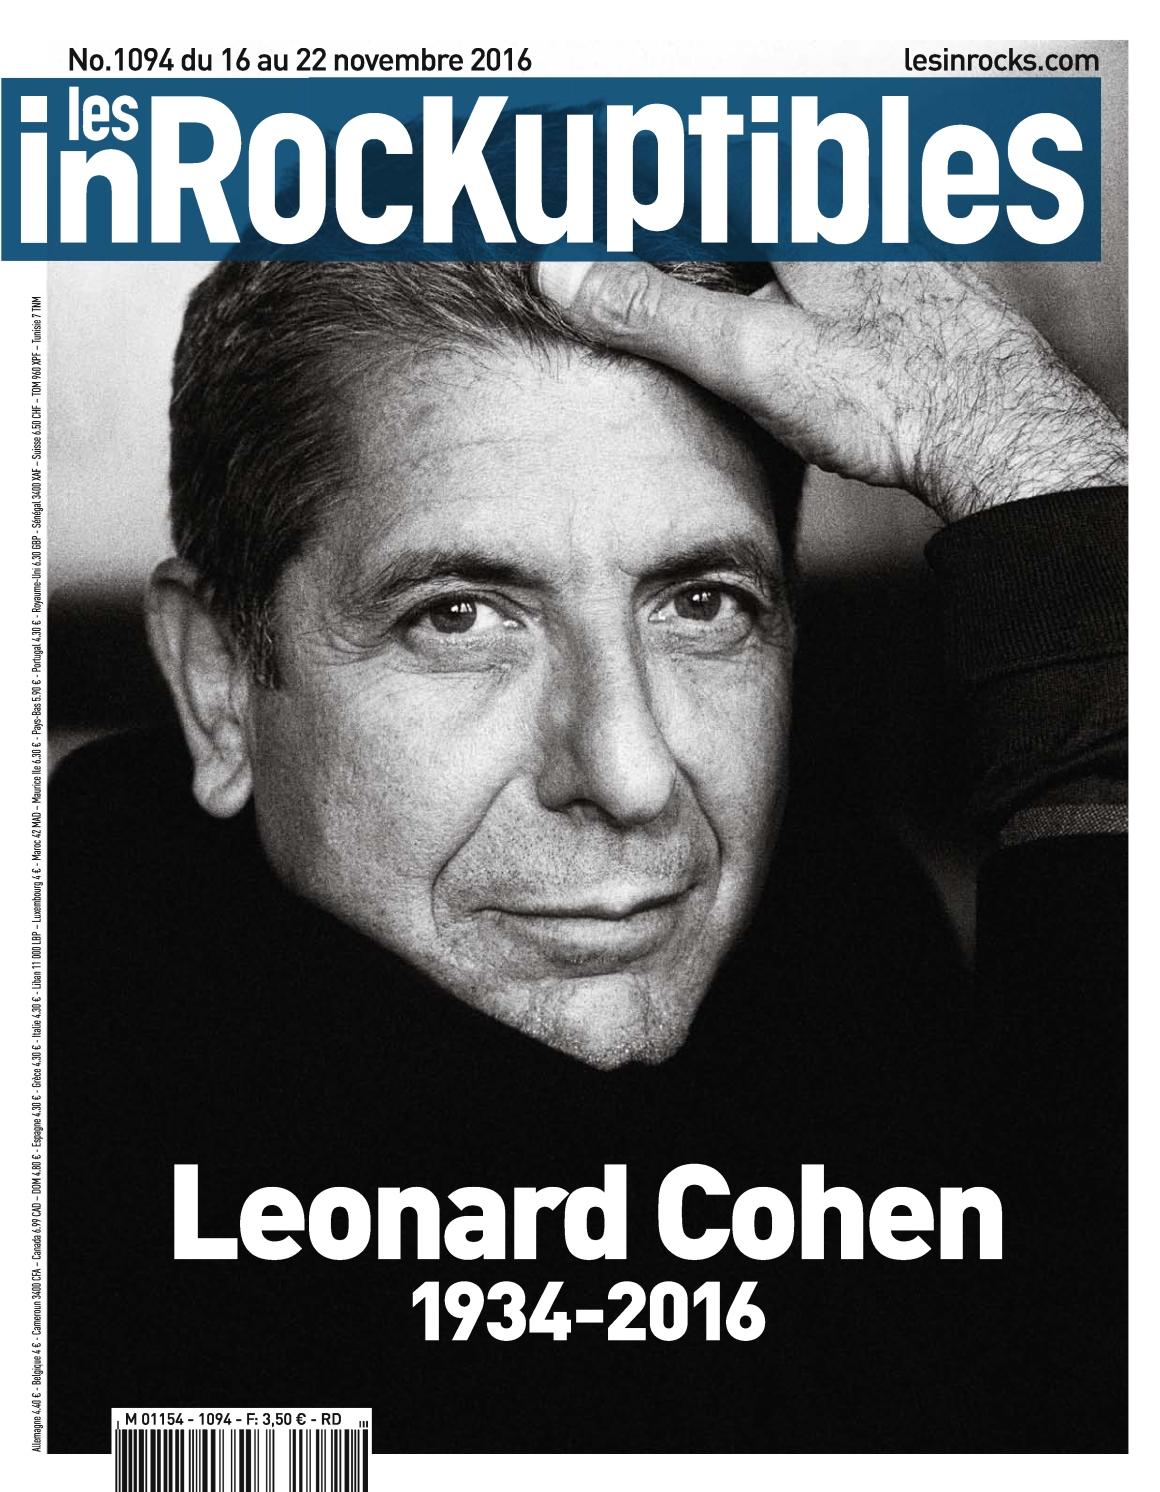 Les Inrockuptibles 1094 - 16 au 22 Novembre 2016